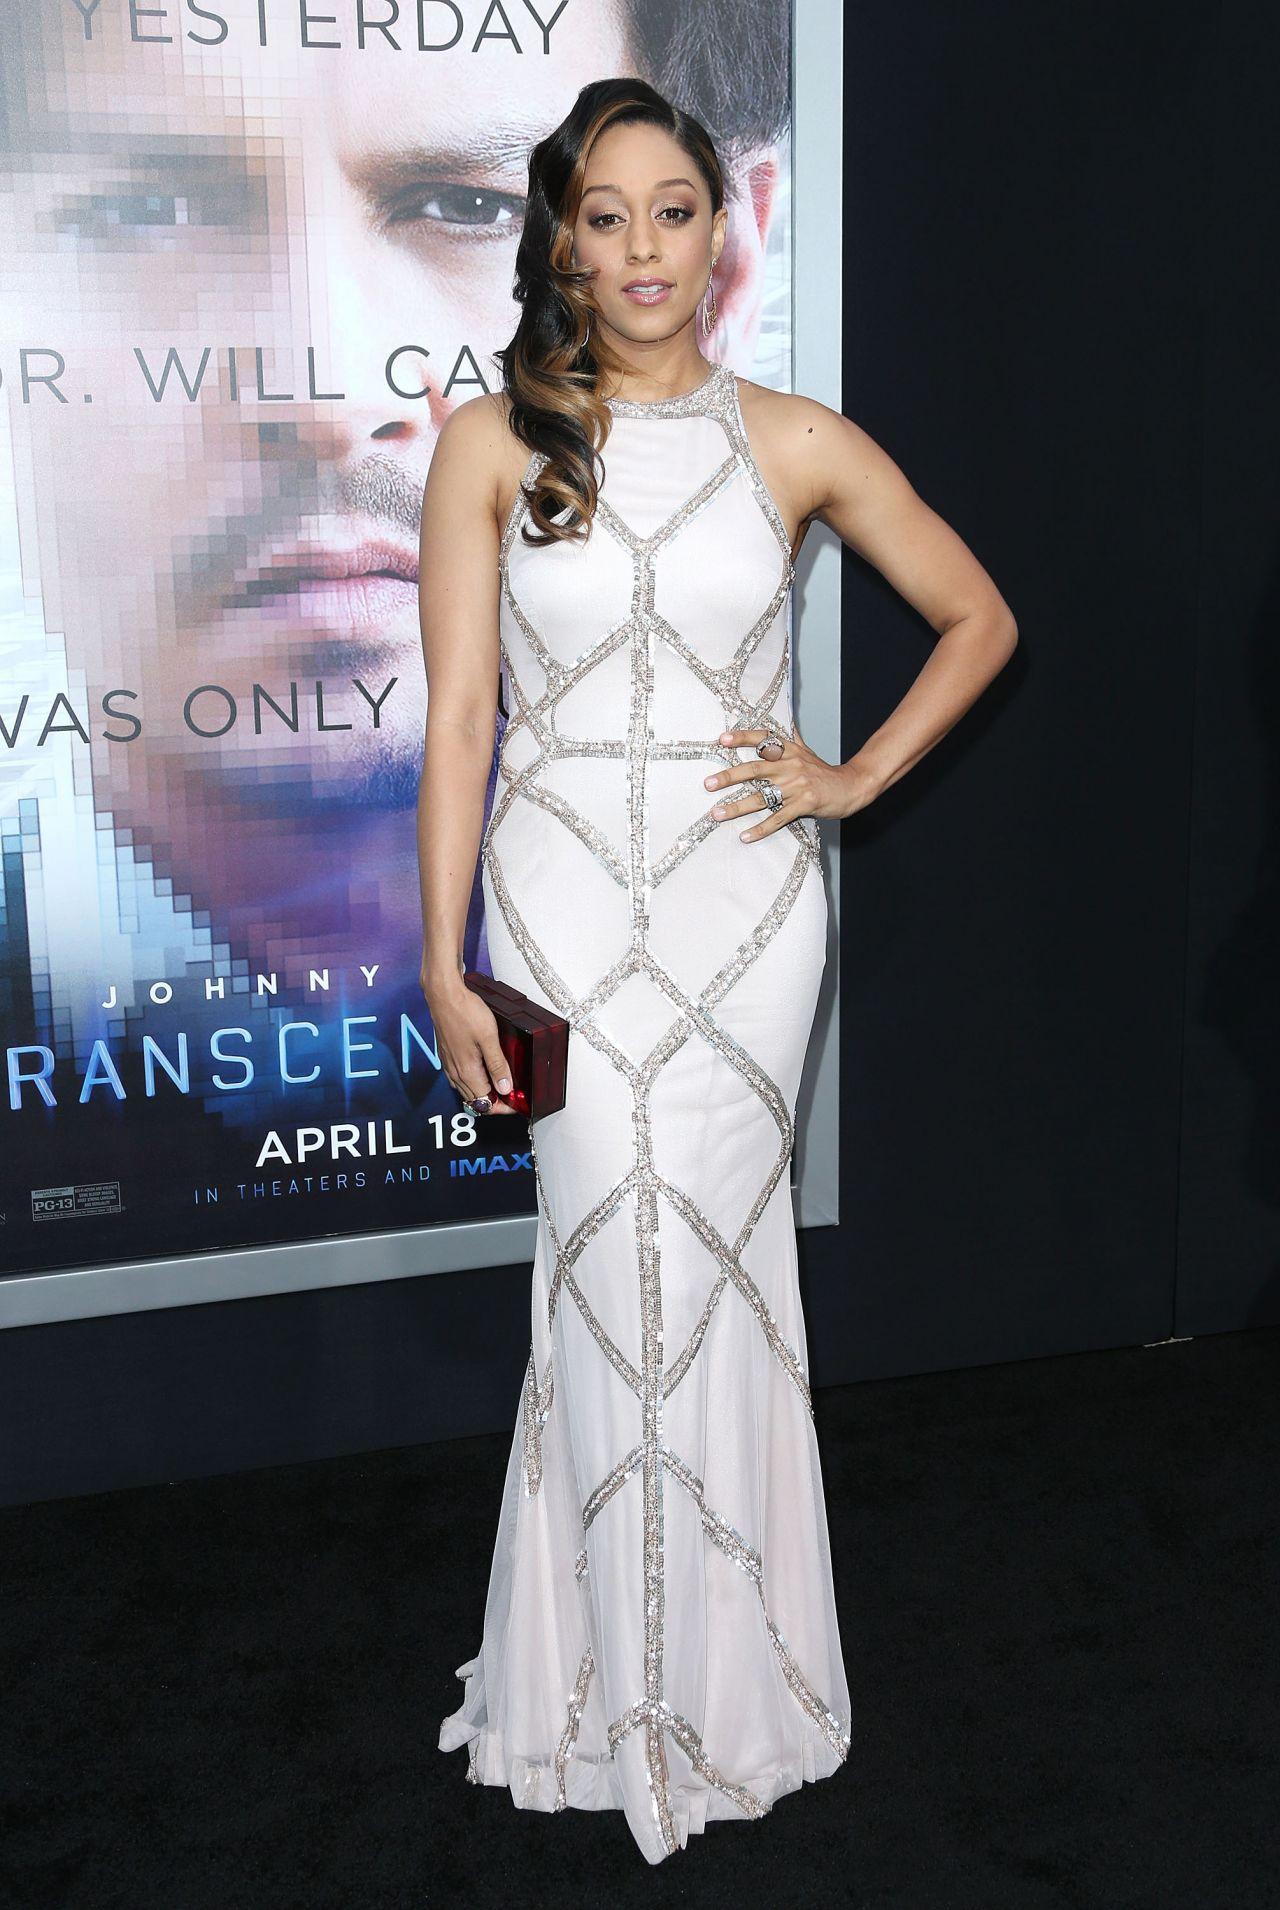 Tia Mowry Wearing Rachel Gilbertau Gown -